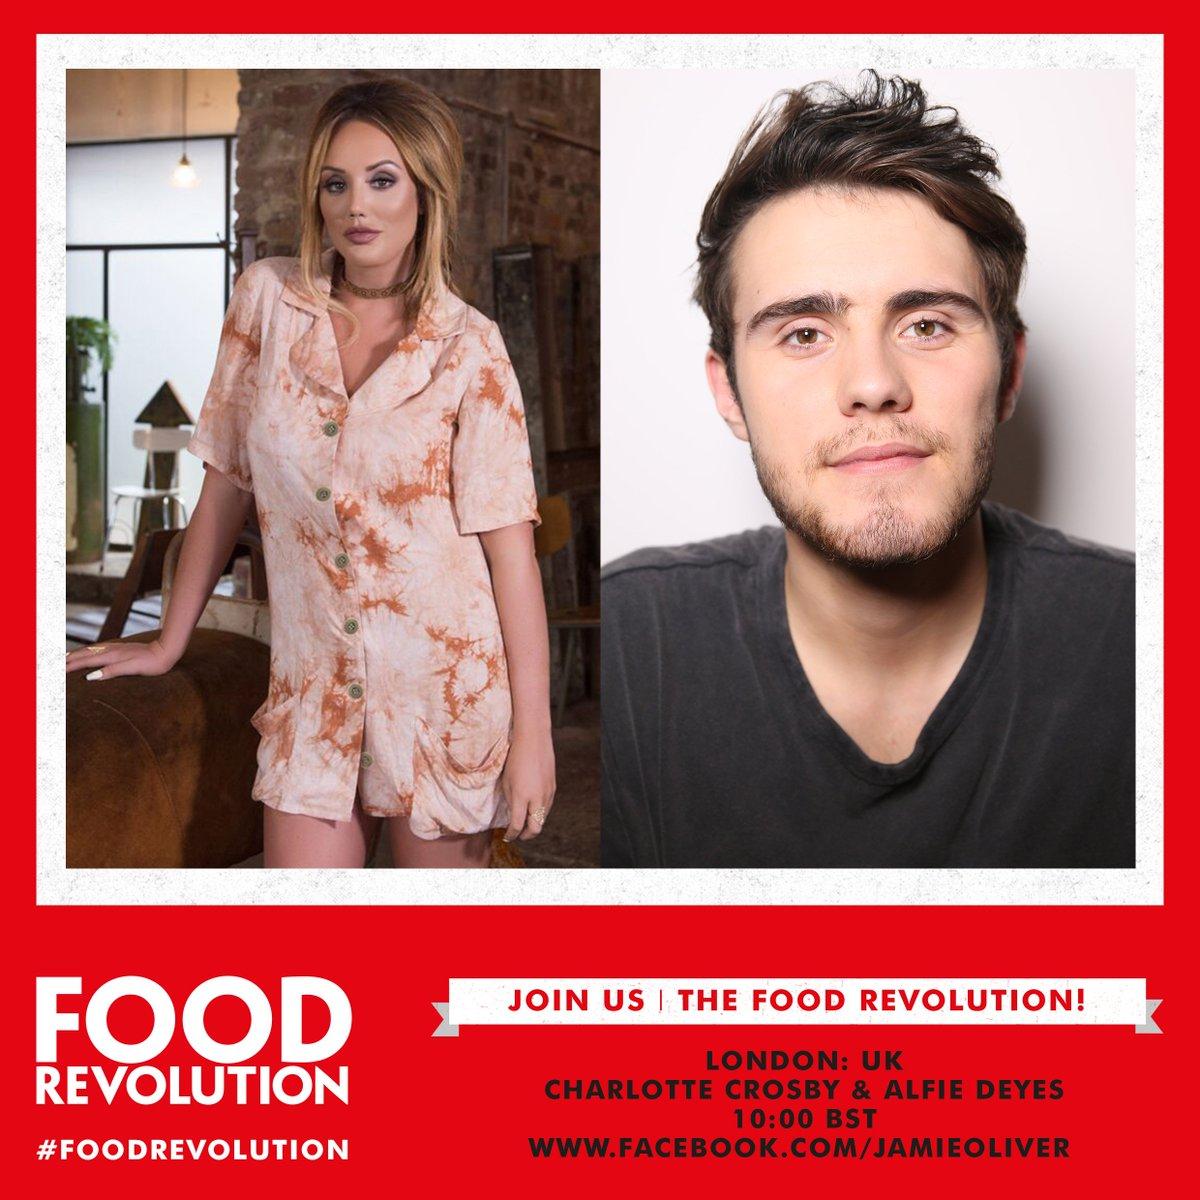 With @Charlottegshore @PointlessBlog @CherylOfficial @TanyaBurr @JimChapman Live on Facebook for #FoodRevolution day https://t.co/OARUp5KunT